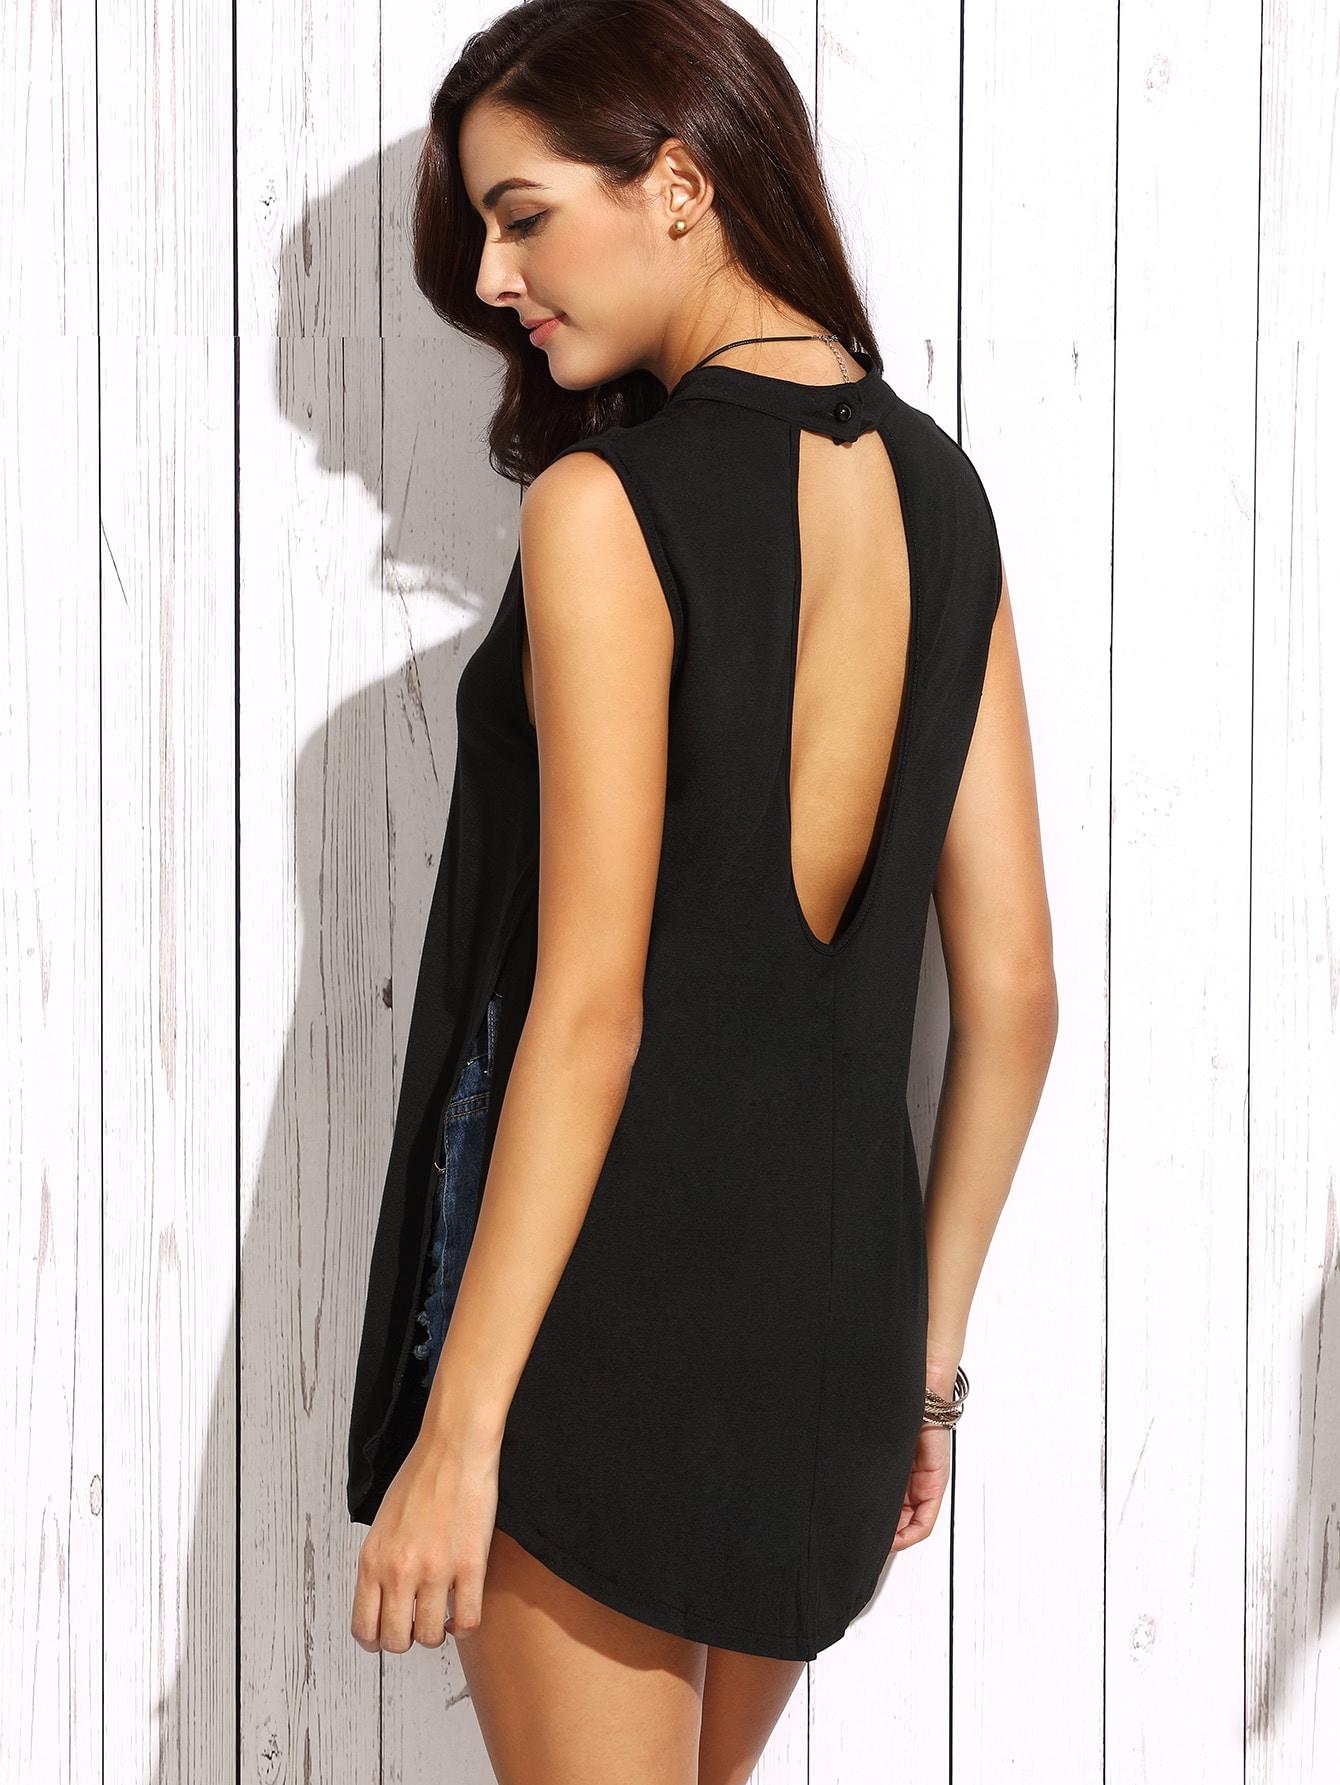 Black Cutout Sides Split Sleeveless Top vest160727301